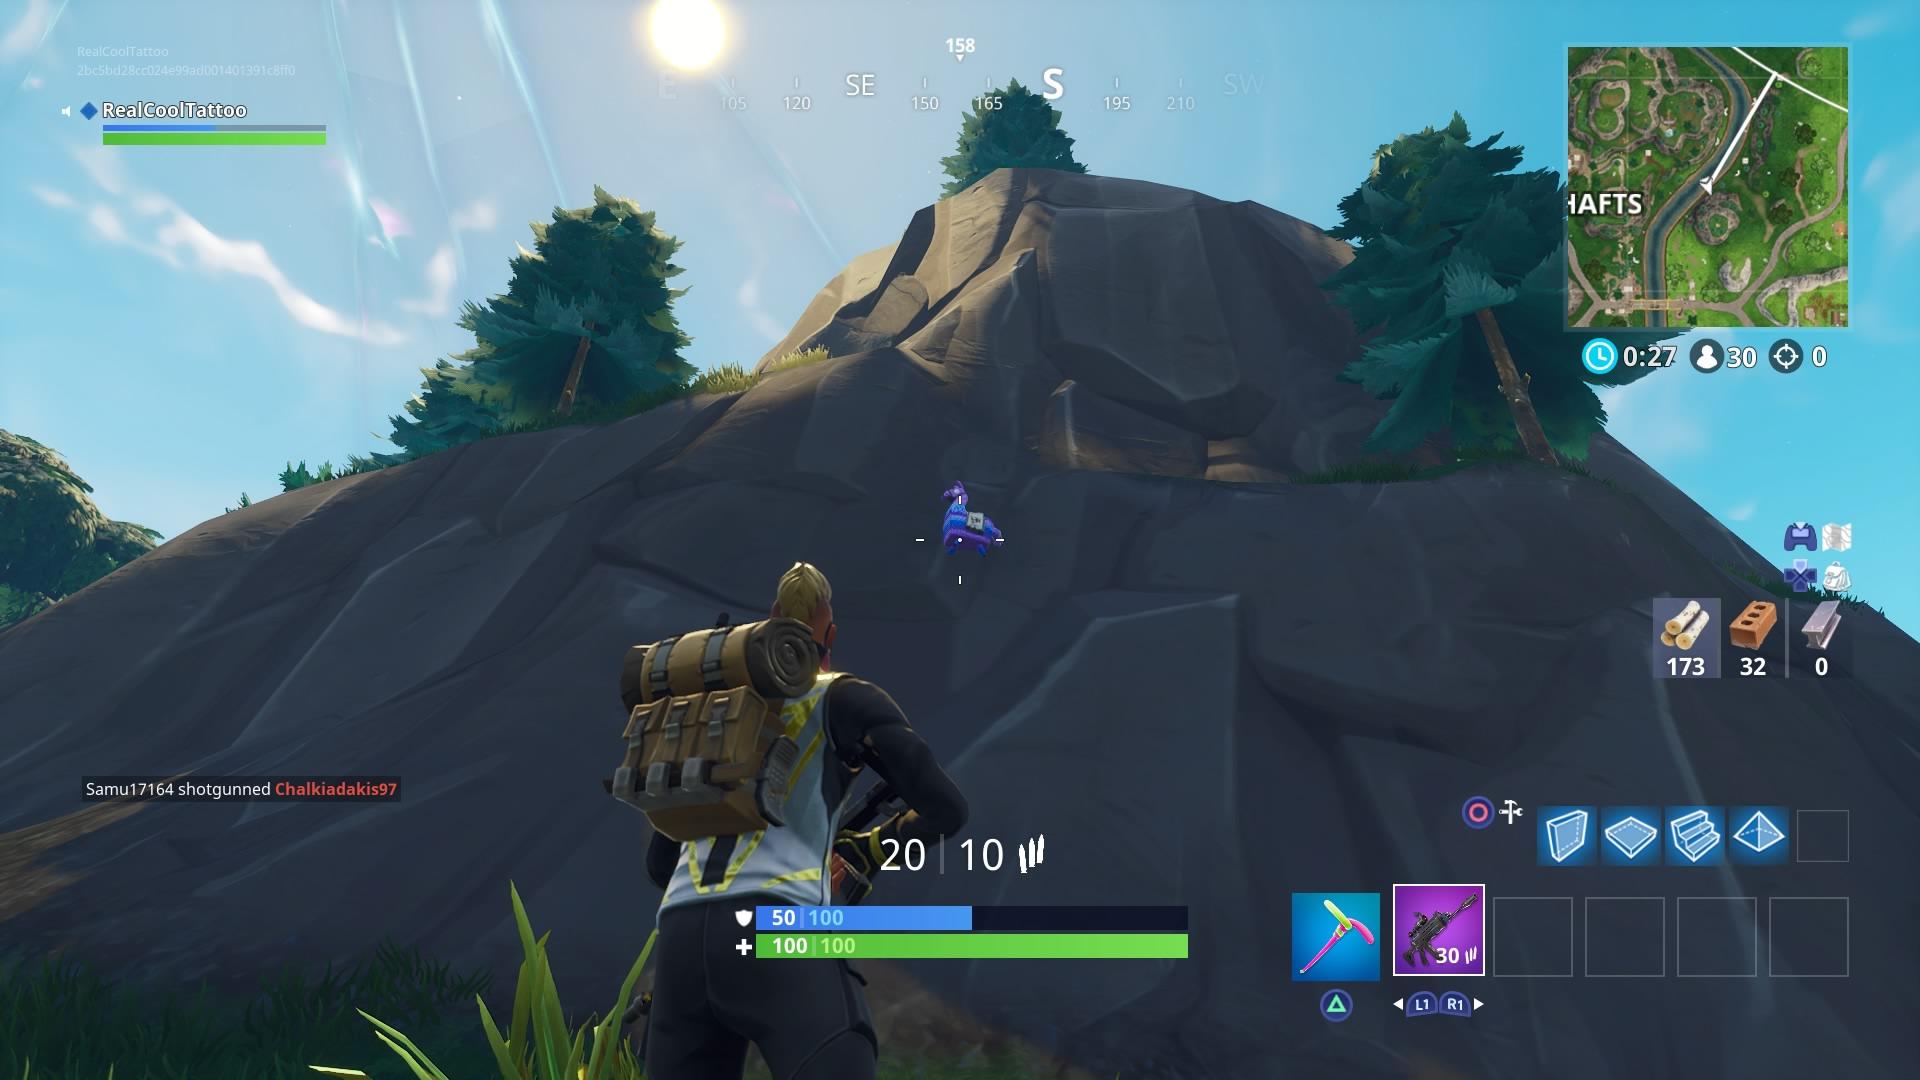 Fortnite Season 6 Supply Llama